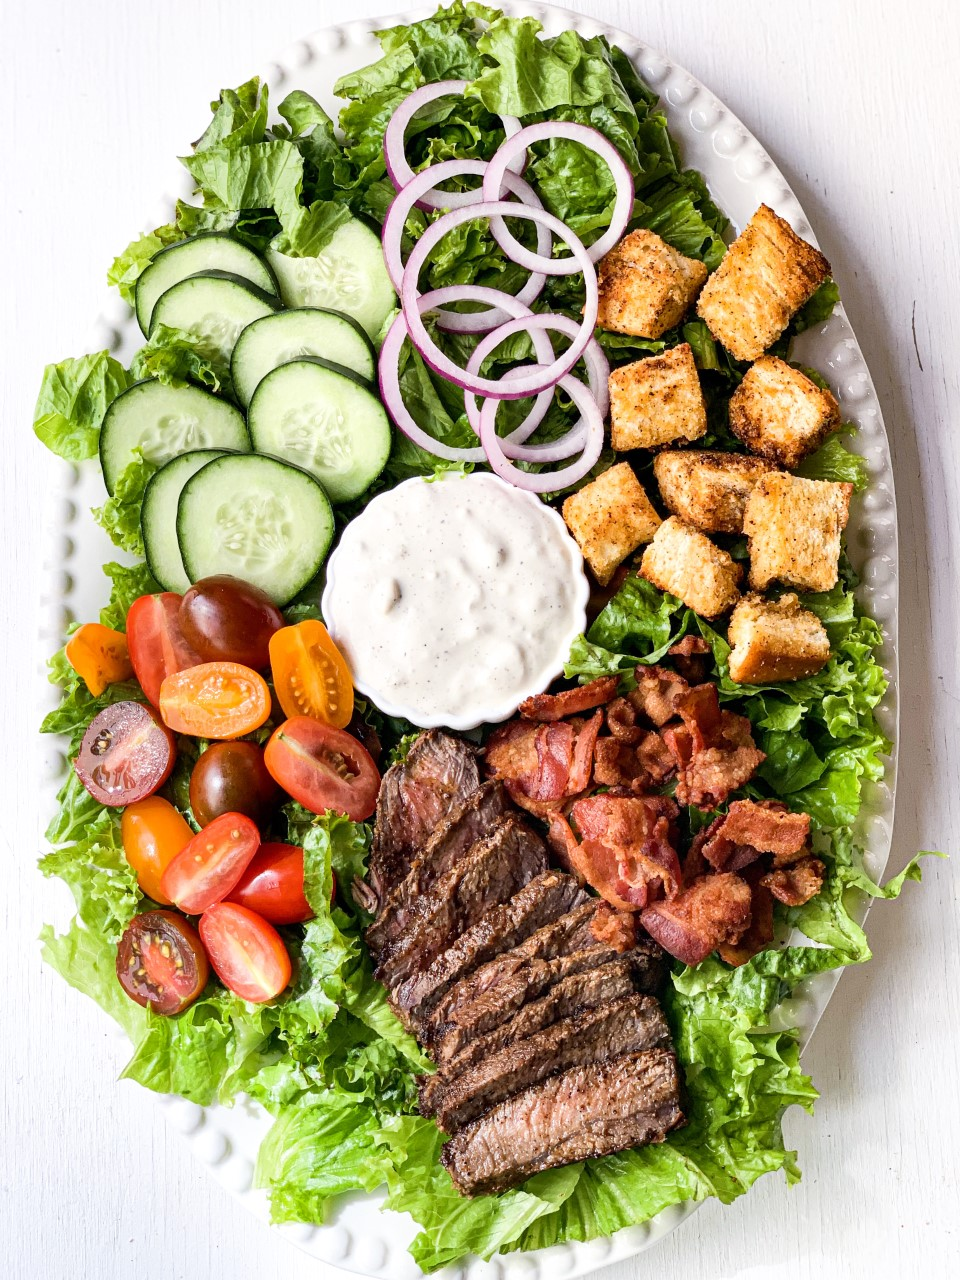 Steak Salad with Blue Cheese Buttermilk Dressing